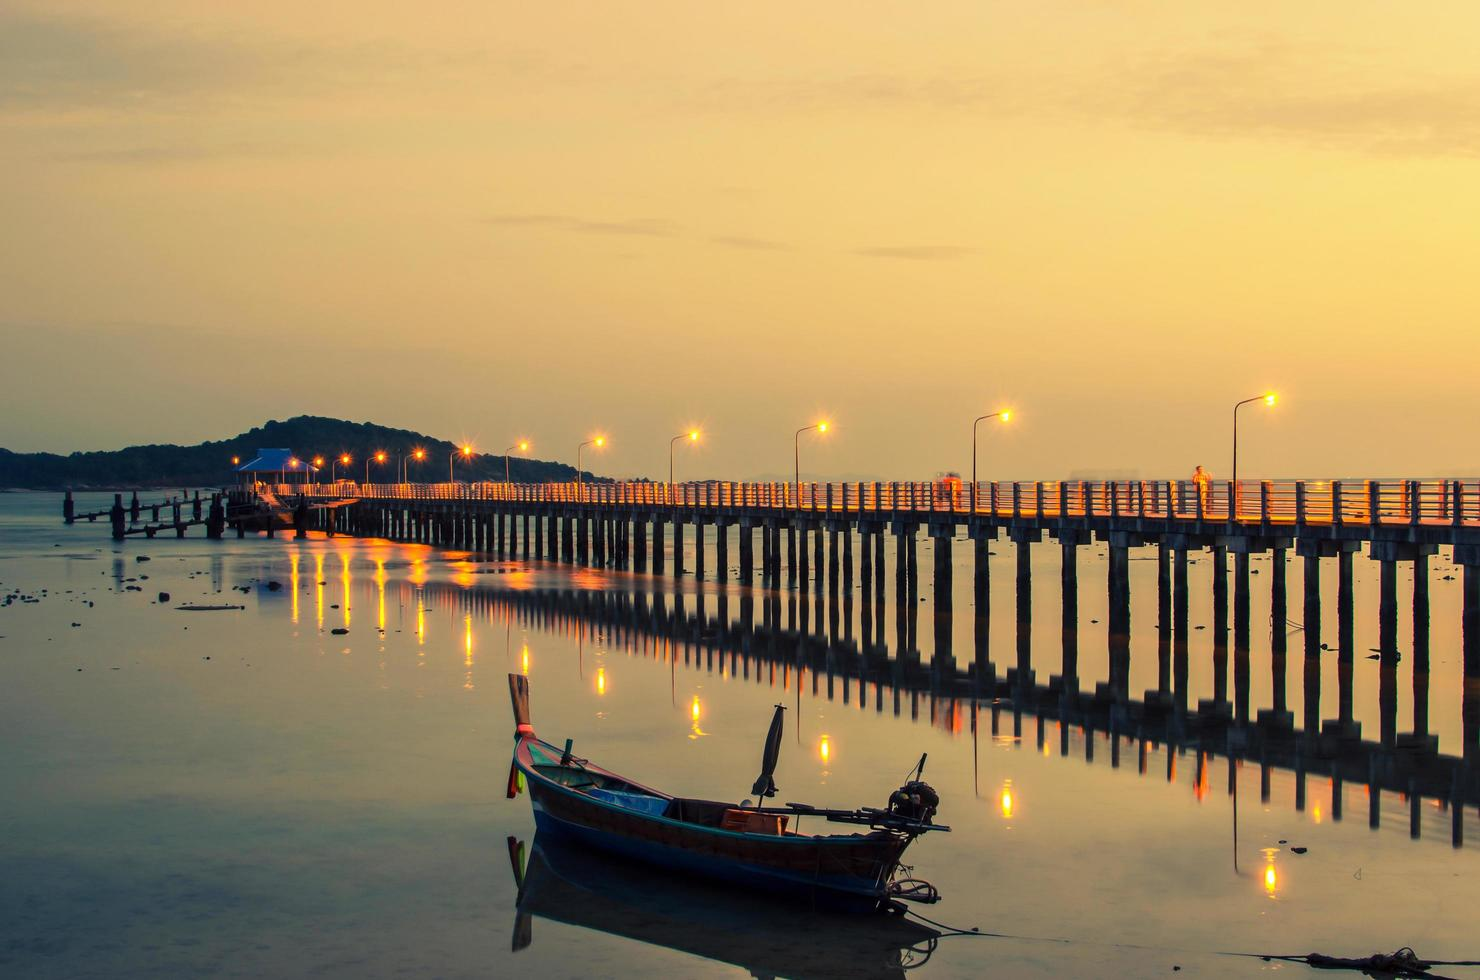 phuket eiland, thailand, 2021 - phuket eiland 's nachts foto